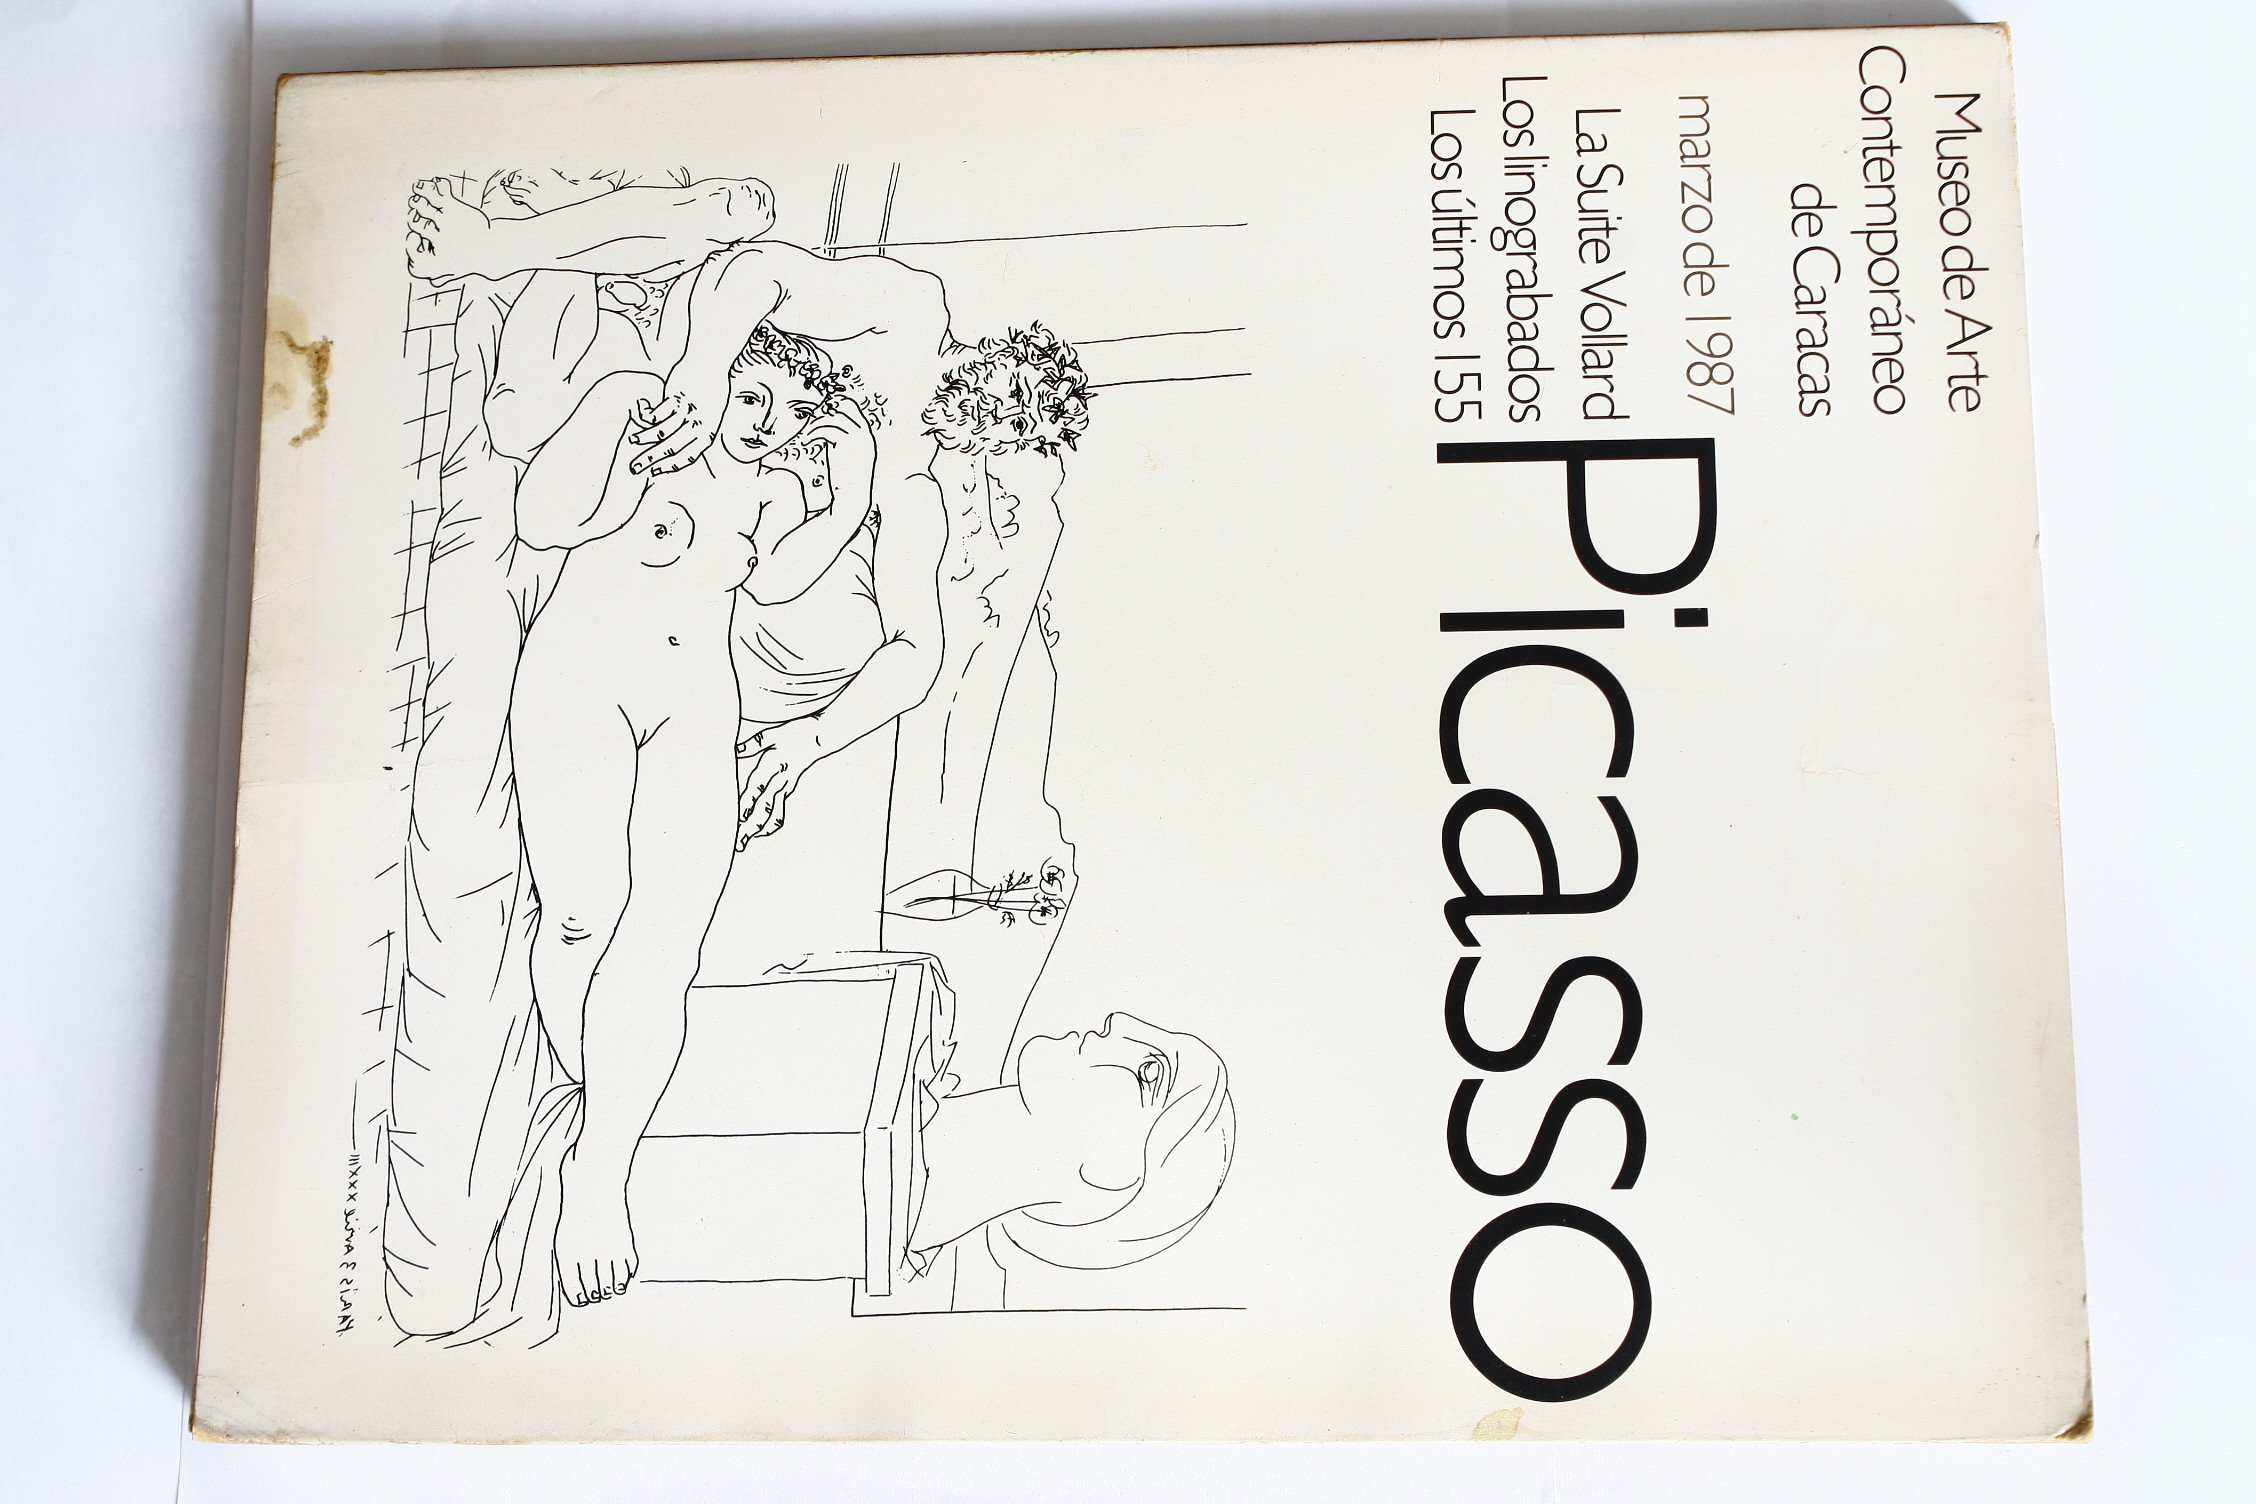 picasso museo de arte contemporaneo de caracas marzo de 1987 catalogo spanish edition